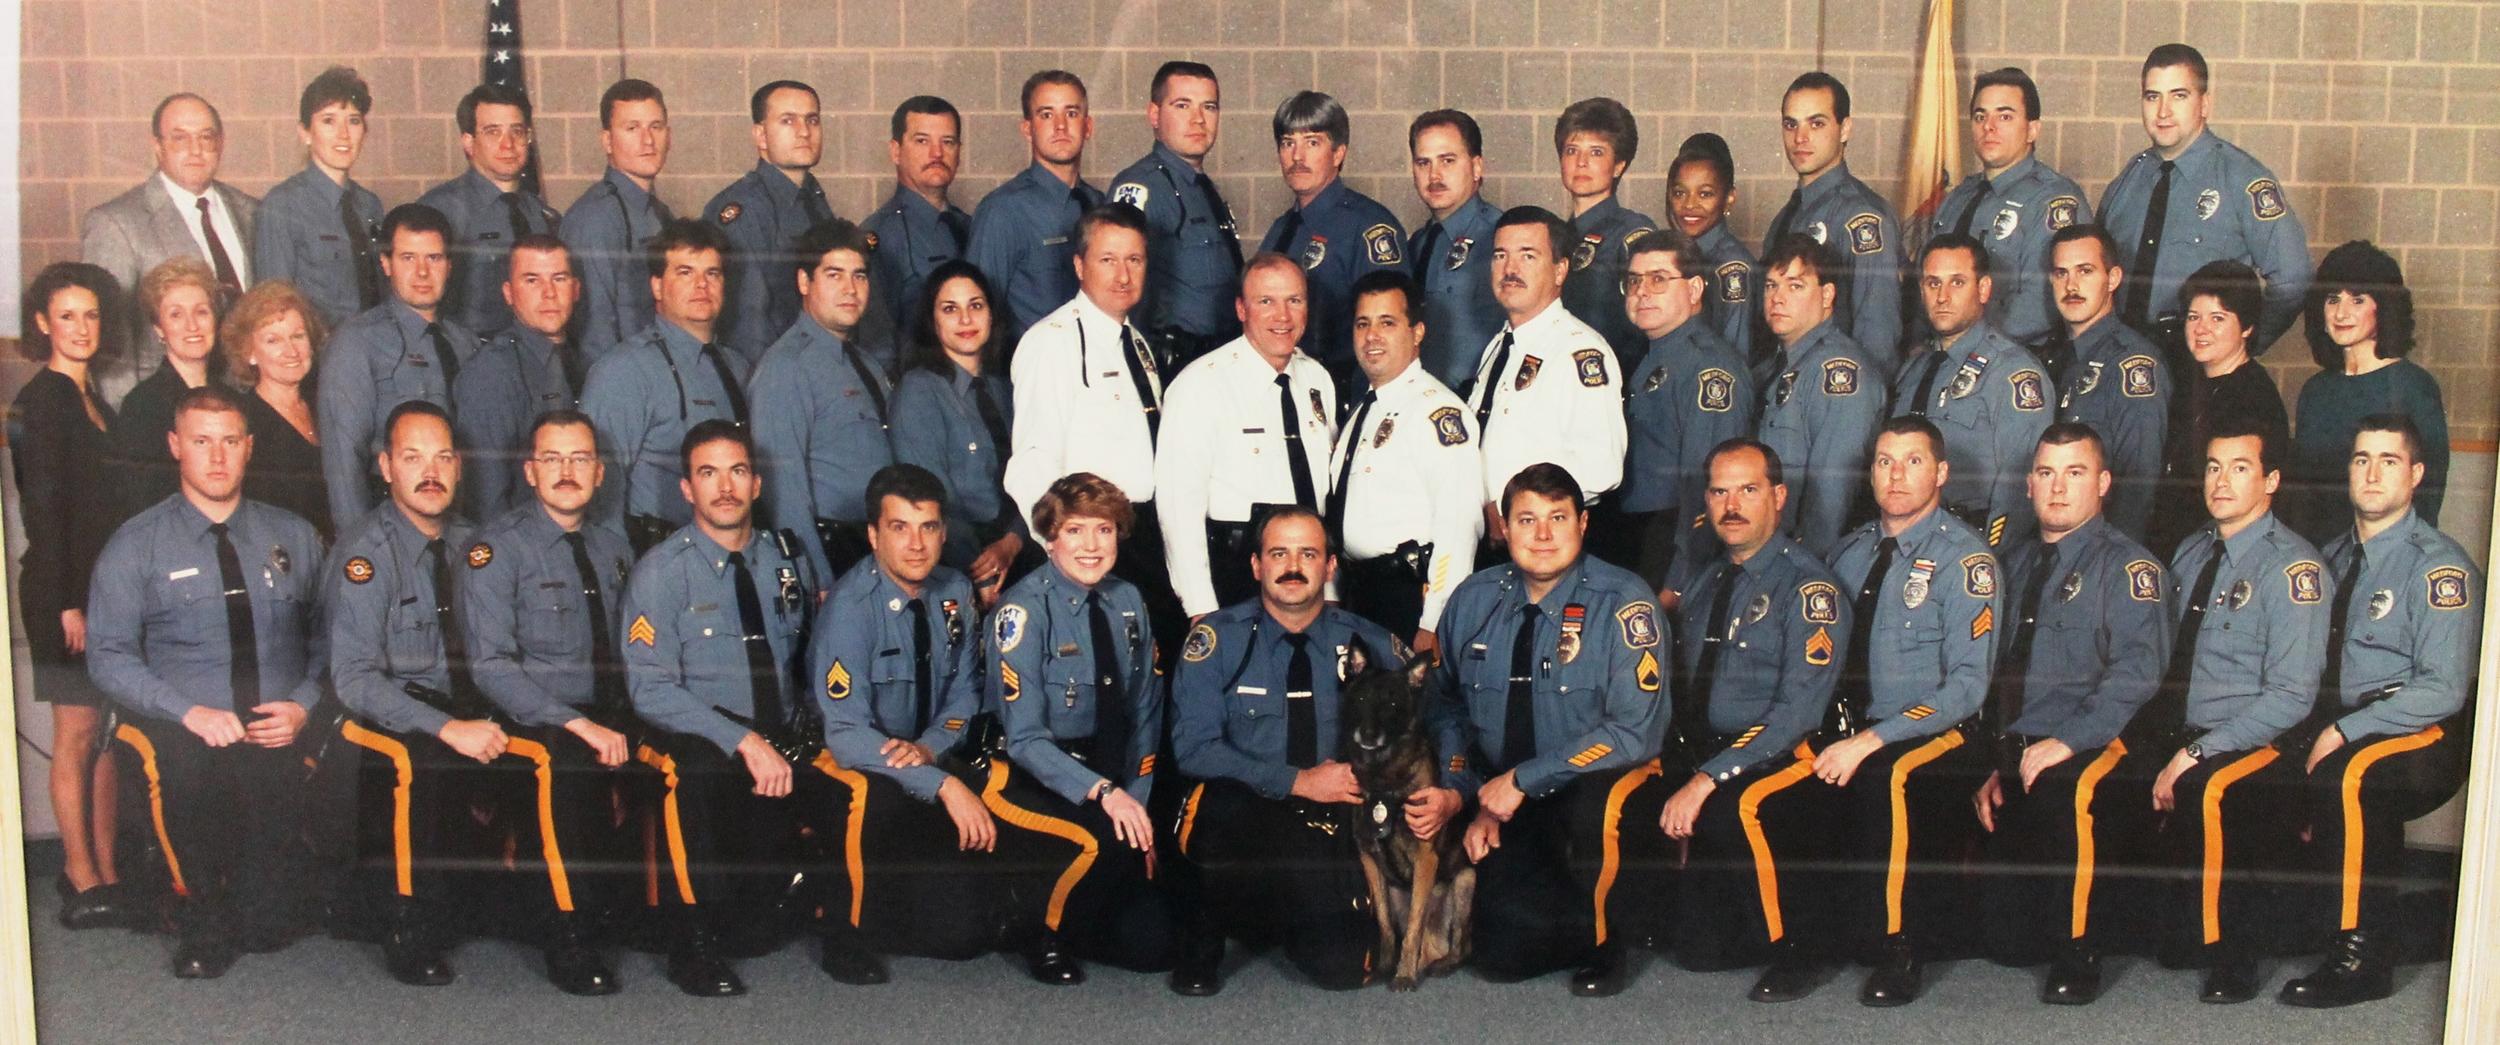 1996 Department Photo